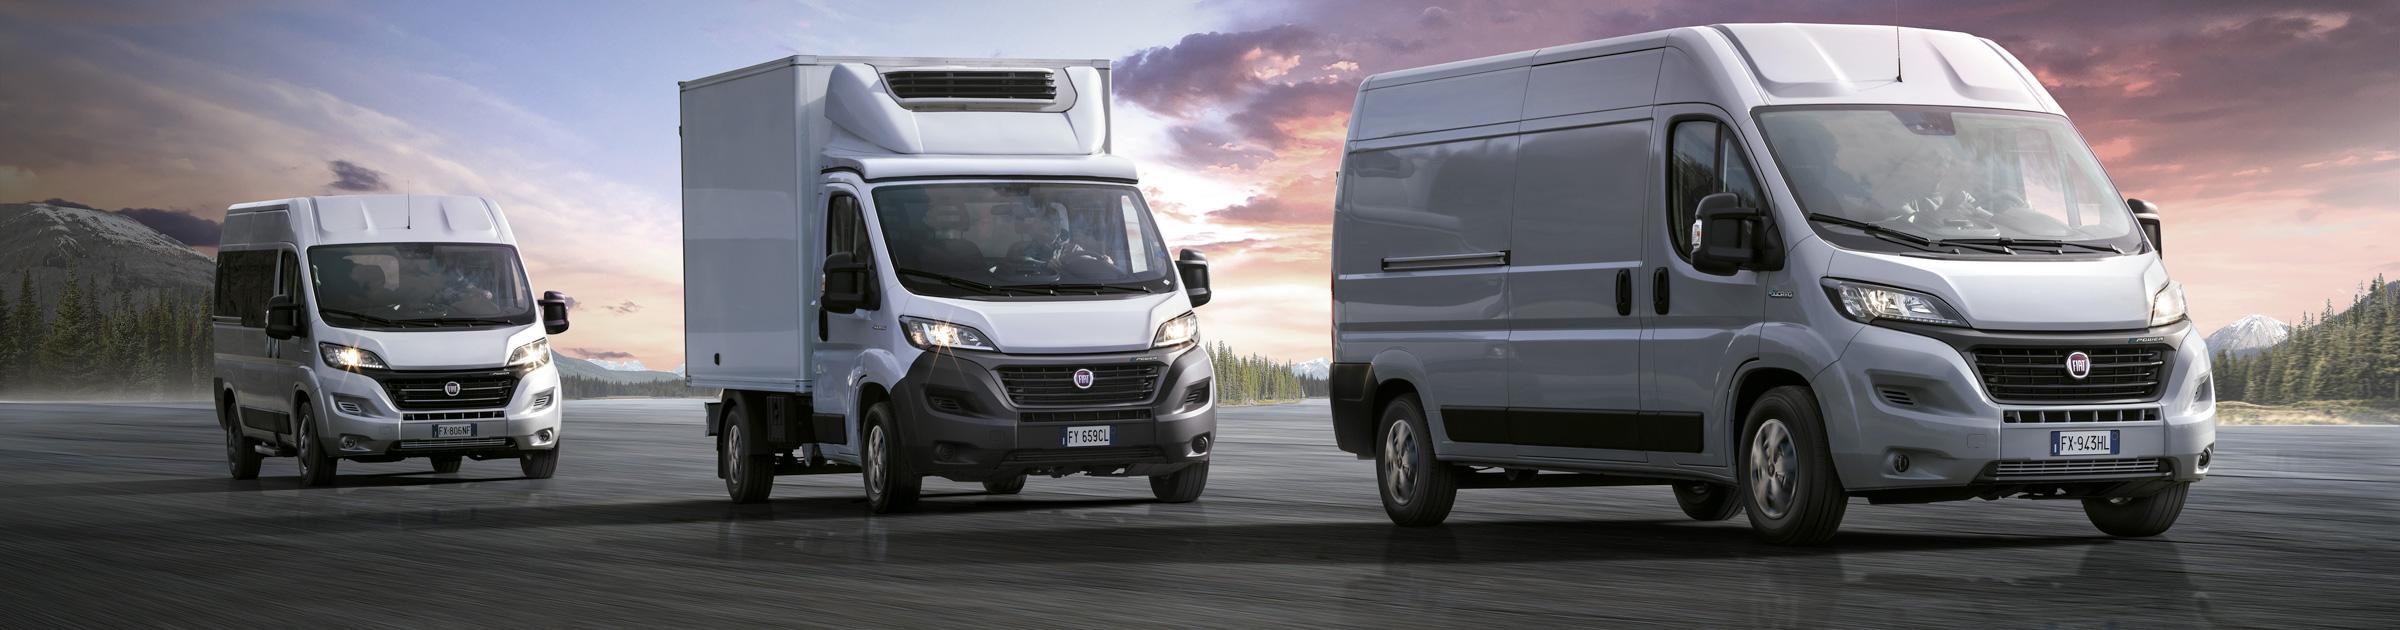 Fiat Professional bedrijfswagen onderhoud